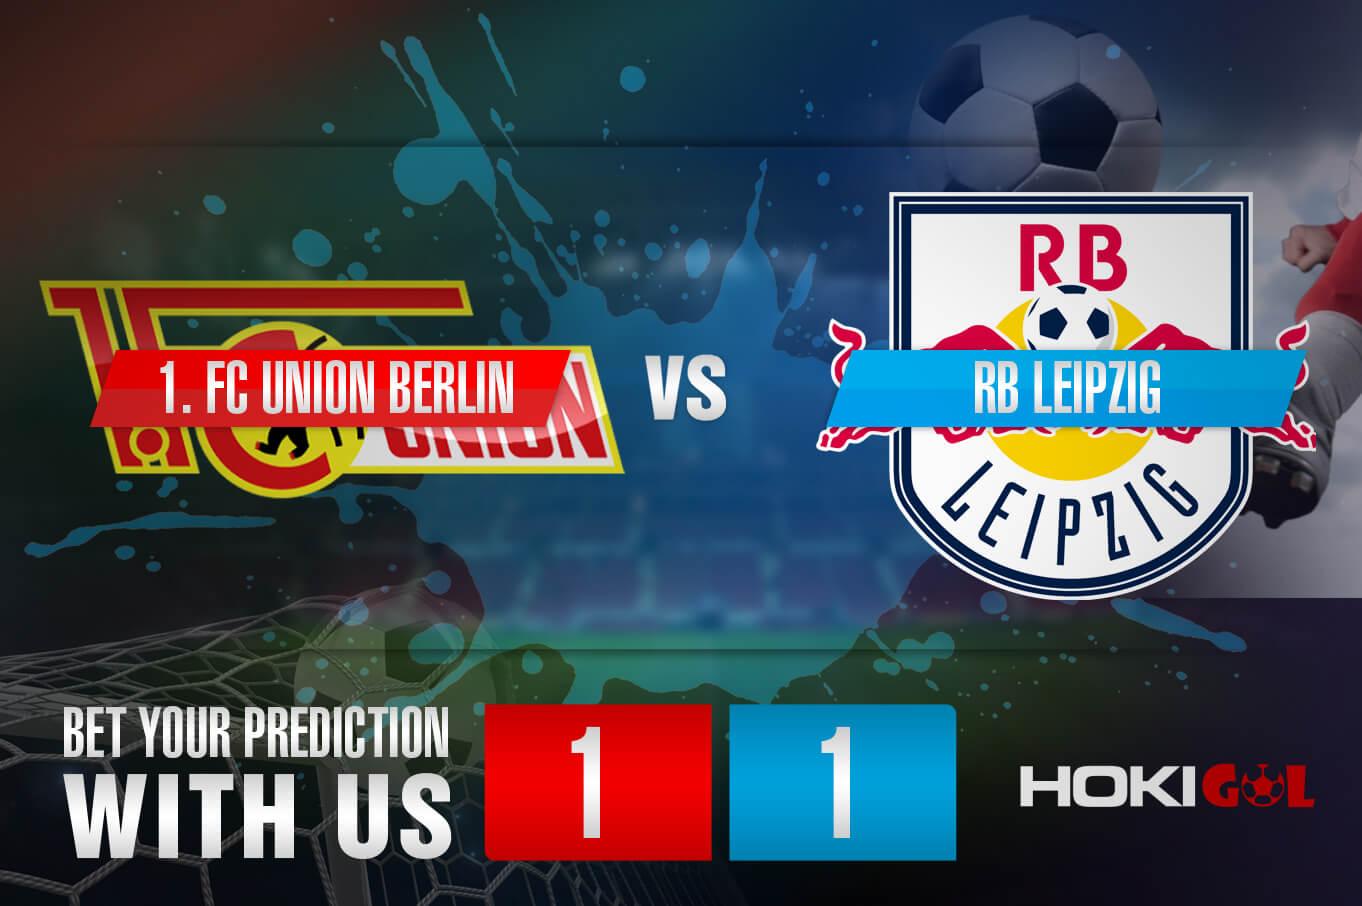 Prediksi Bola 1. FC Union Berlin Vs RB Leipzig 22 Mei 2021